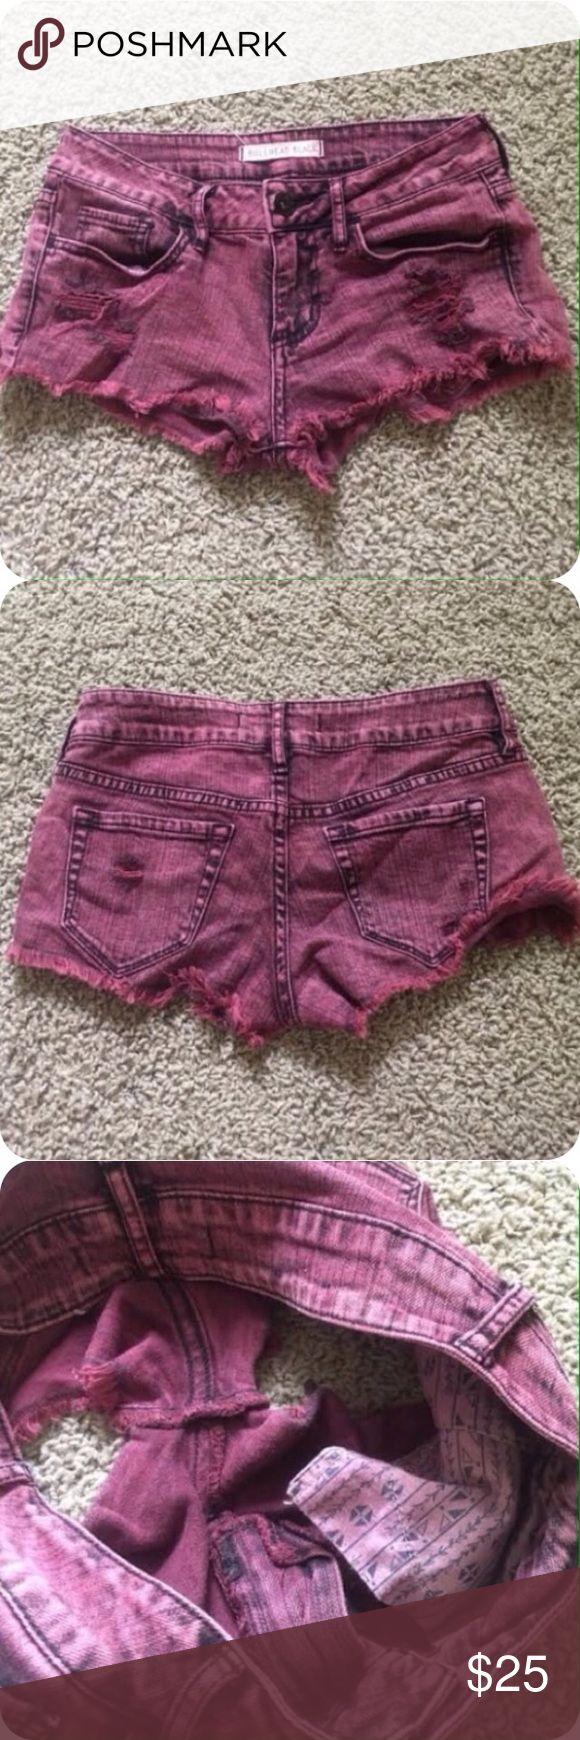 Bullhead Maroon Shorts Worn twice. In excellent condition. Bullhead Shorts Jean Shorts